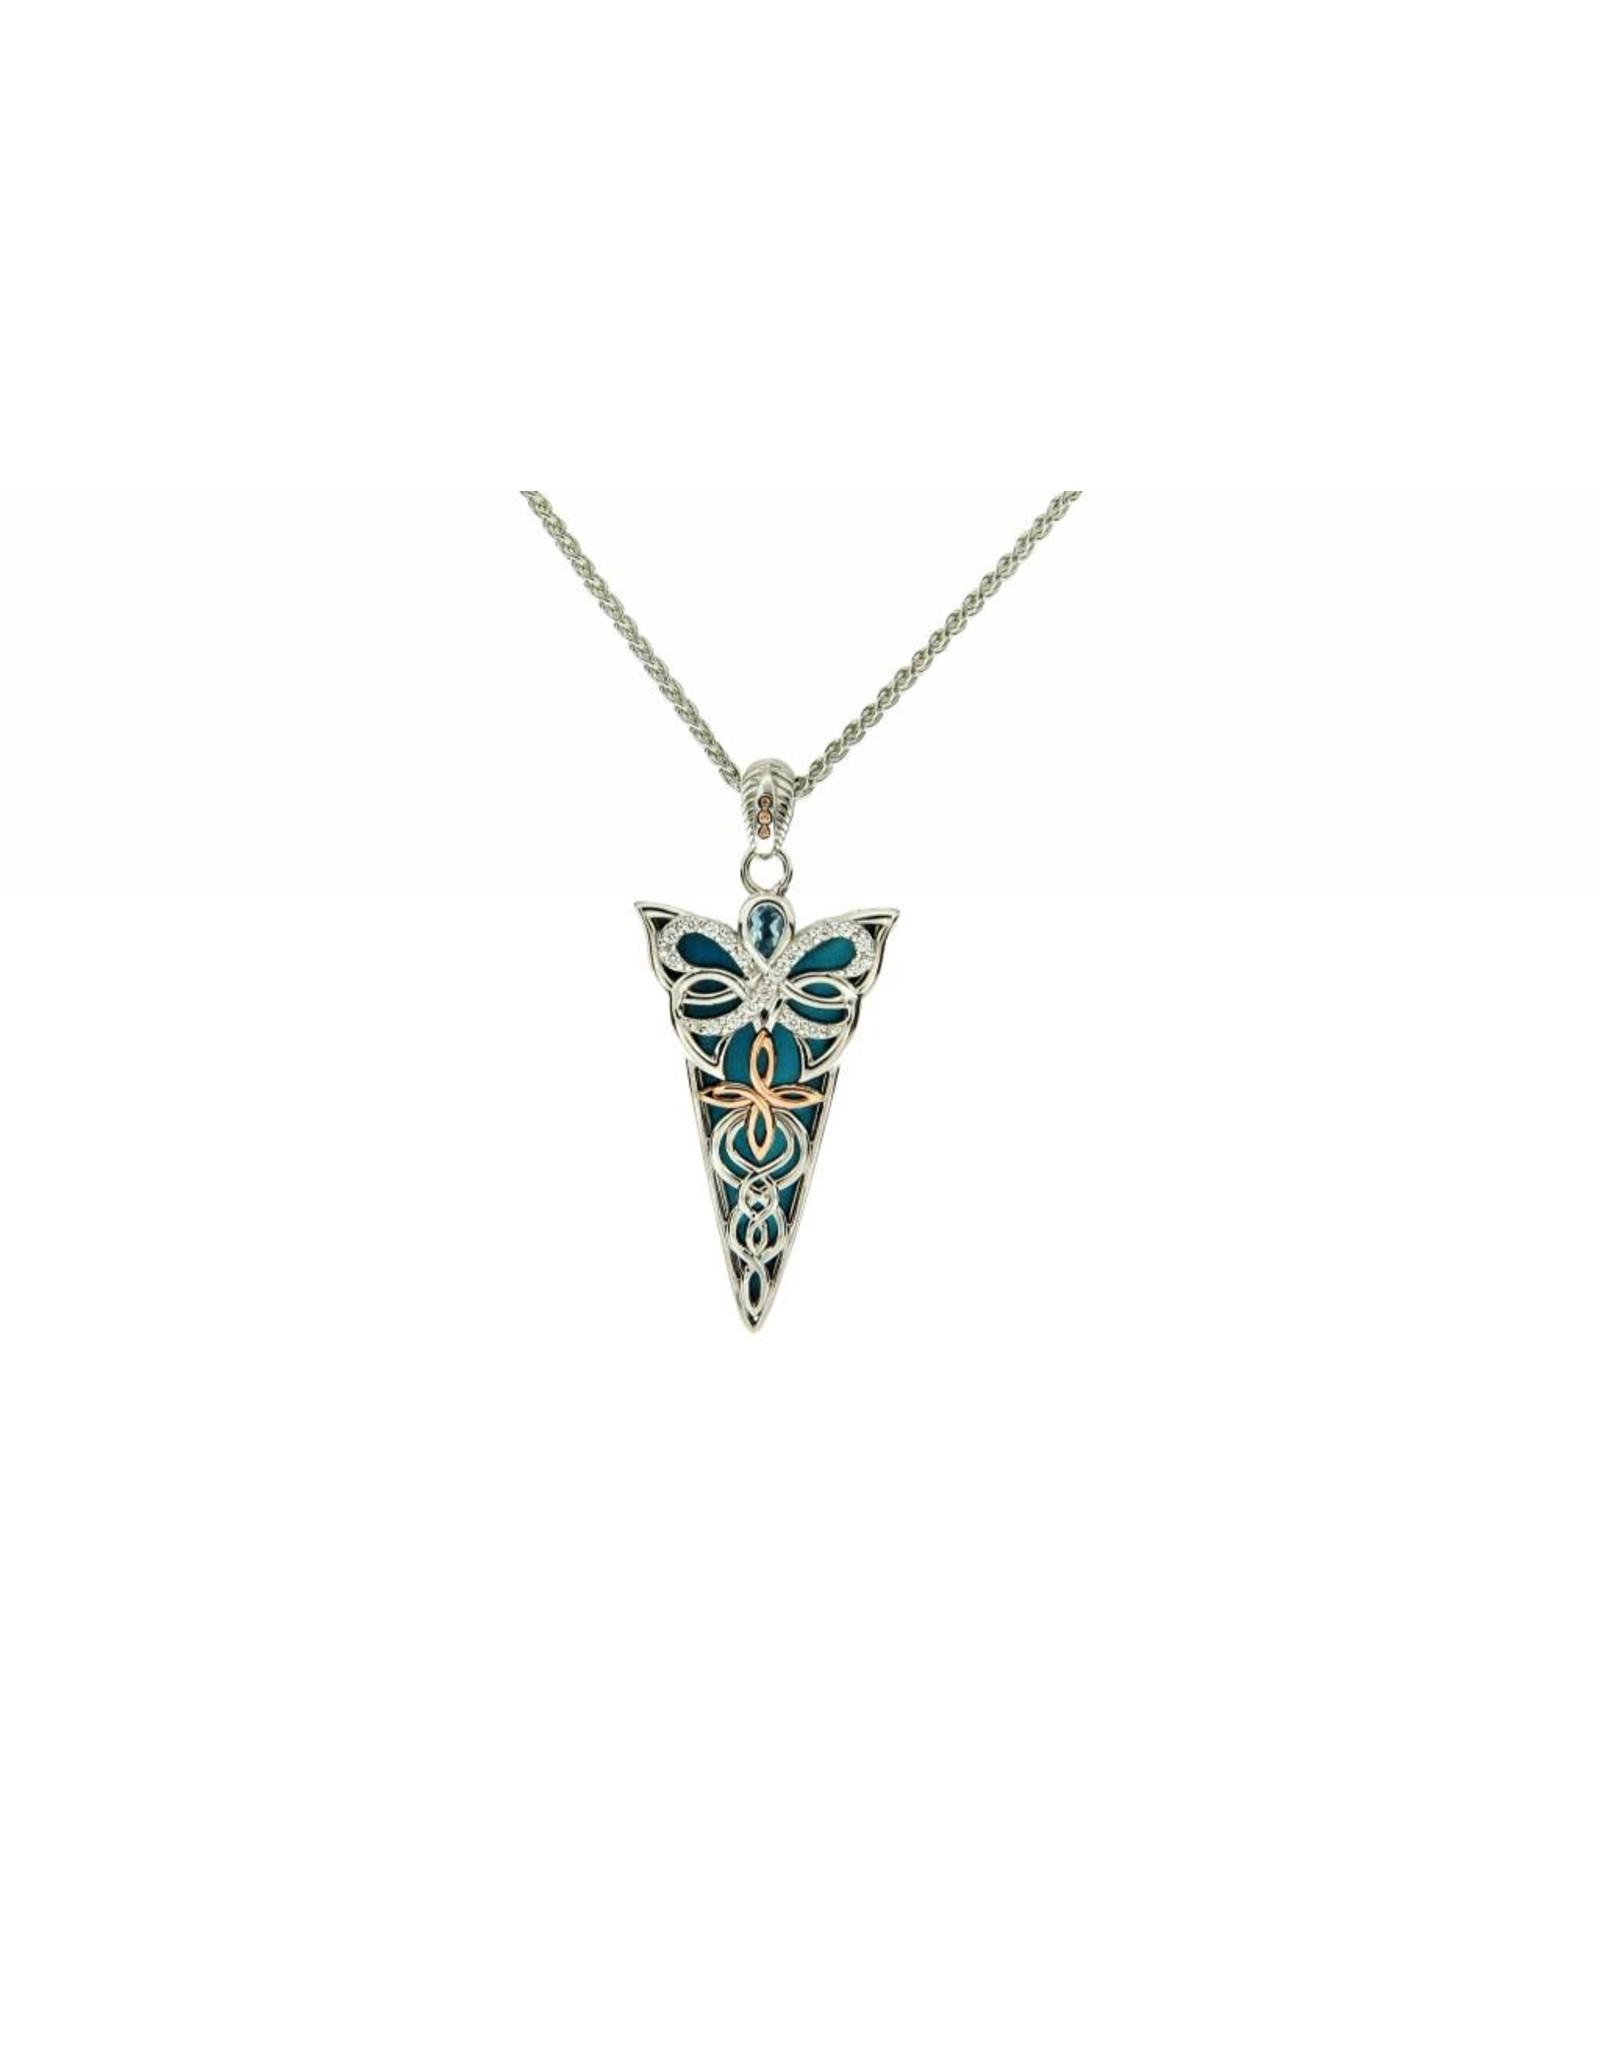 Keith Jack Silver + 10k Rose Gold Enamel Reversible Butterfly Pendant